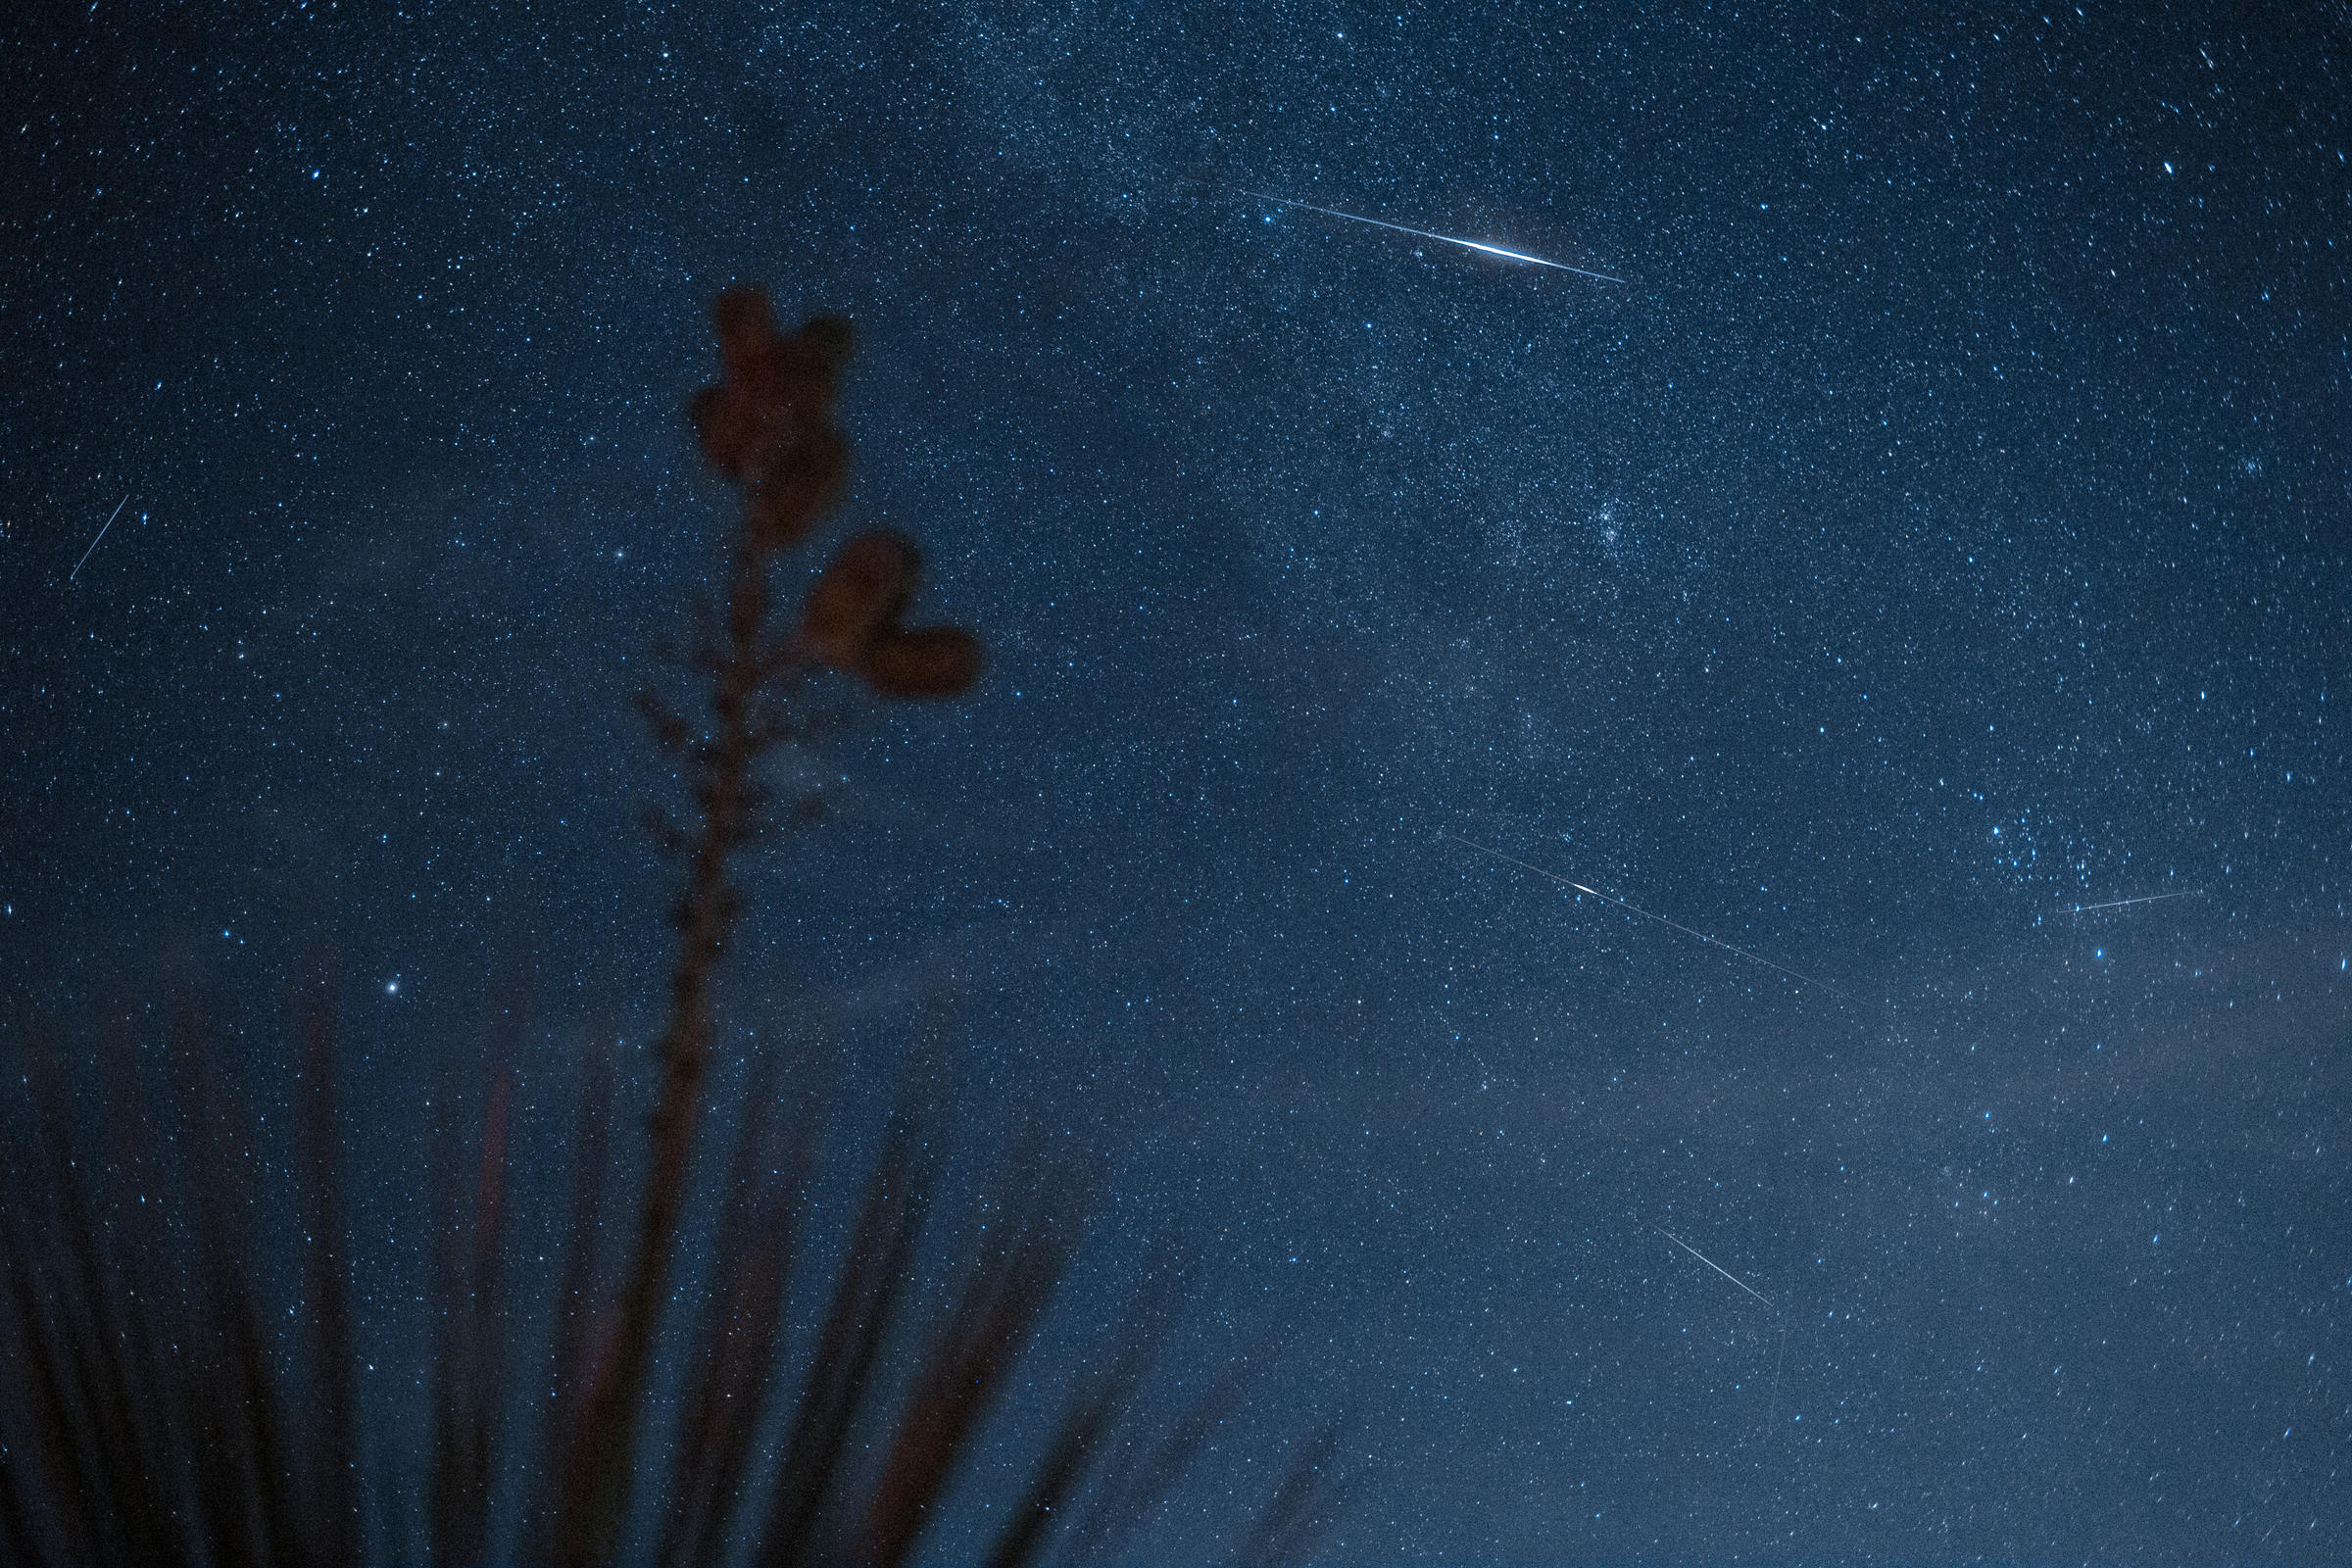 August 2019 Meteor Shower: Perseids